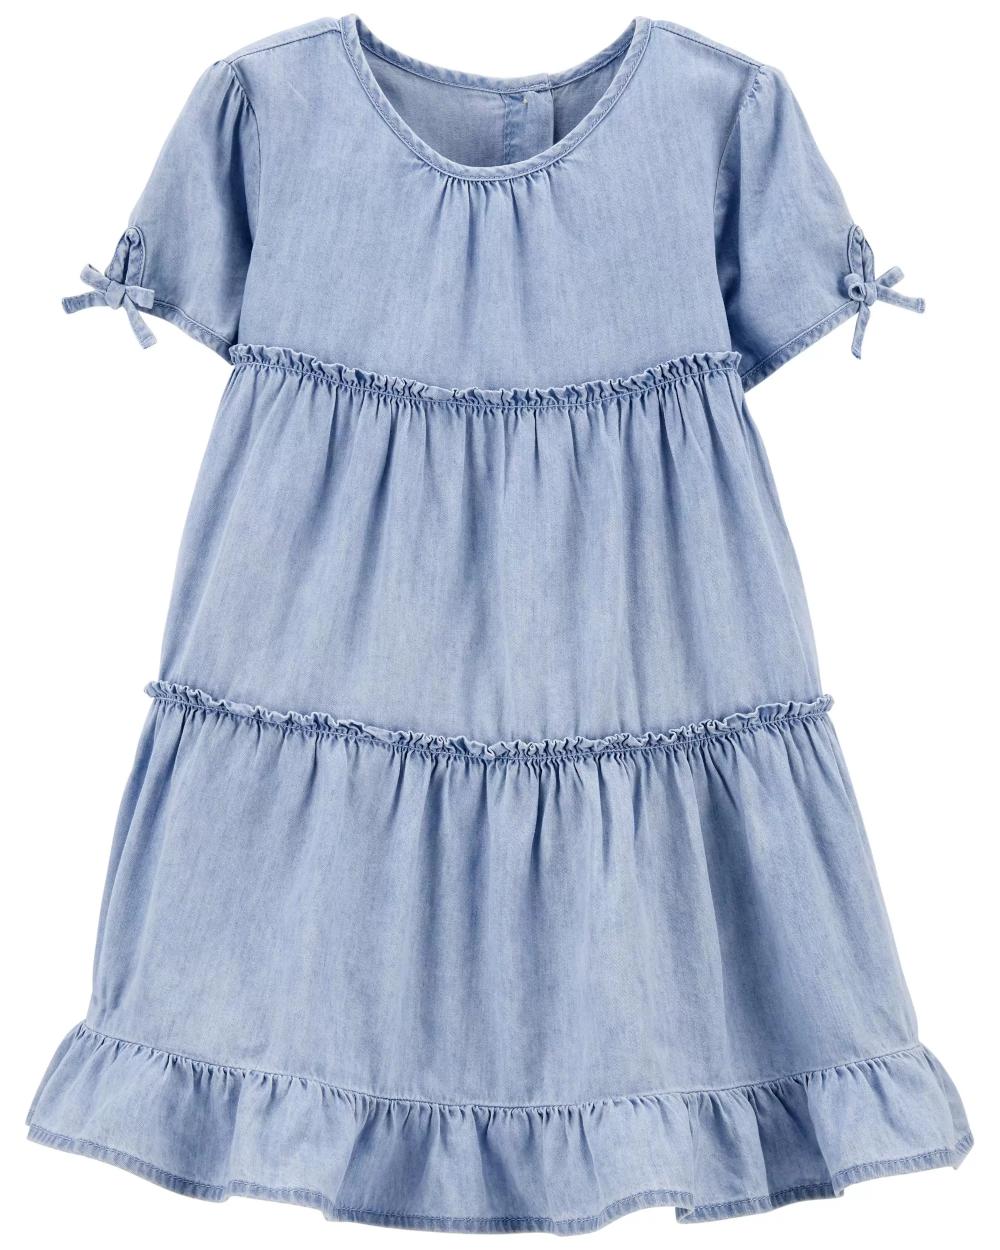 Tiered Ruffle Denim Dress In 2021 Denim Ruffle Dress Girls Jean Dress Americana Dress [ 1250 x 1000 Pixel ]